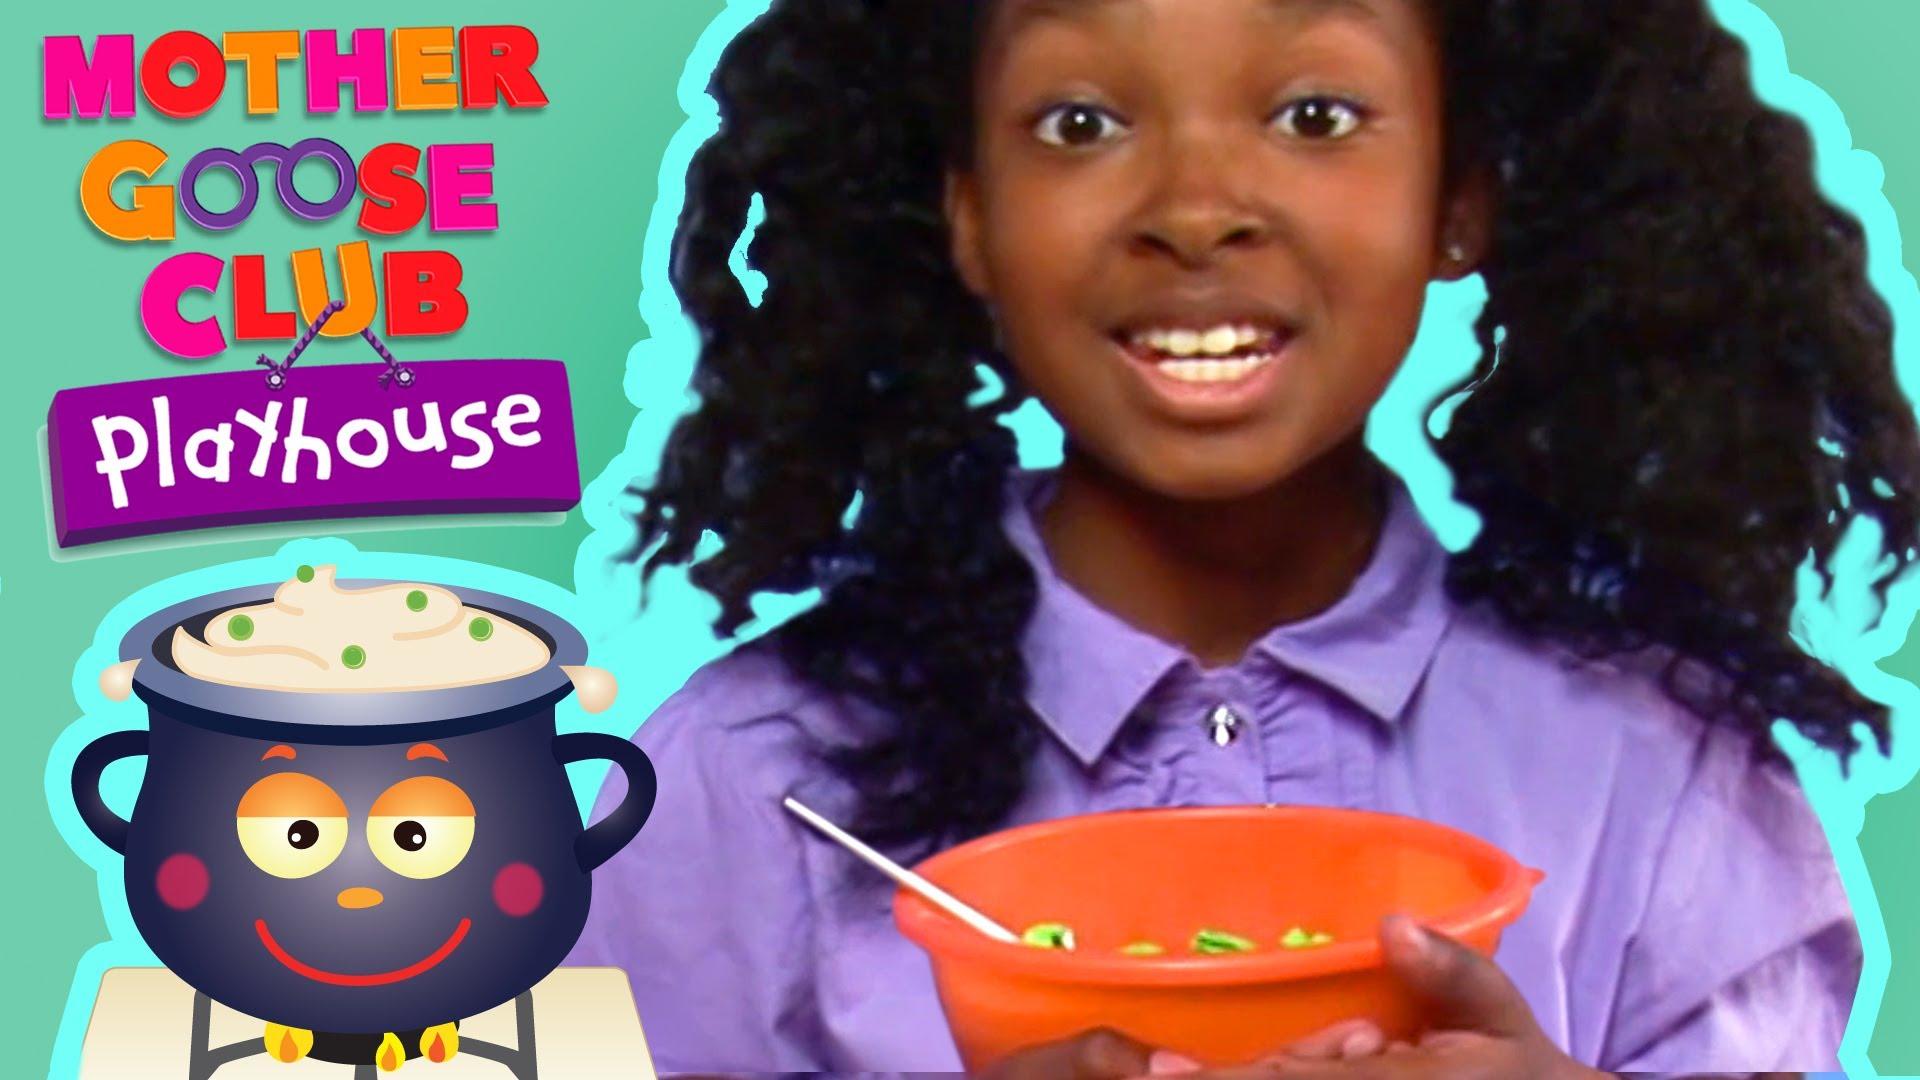 Pease Porridge Hot | Mother Goose Club Playhouse Kids Video